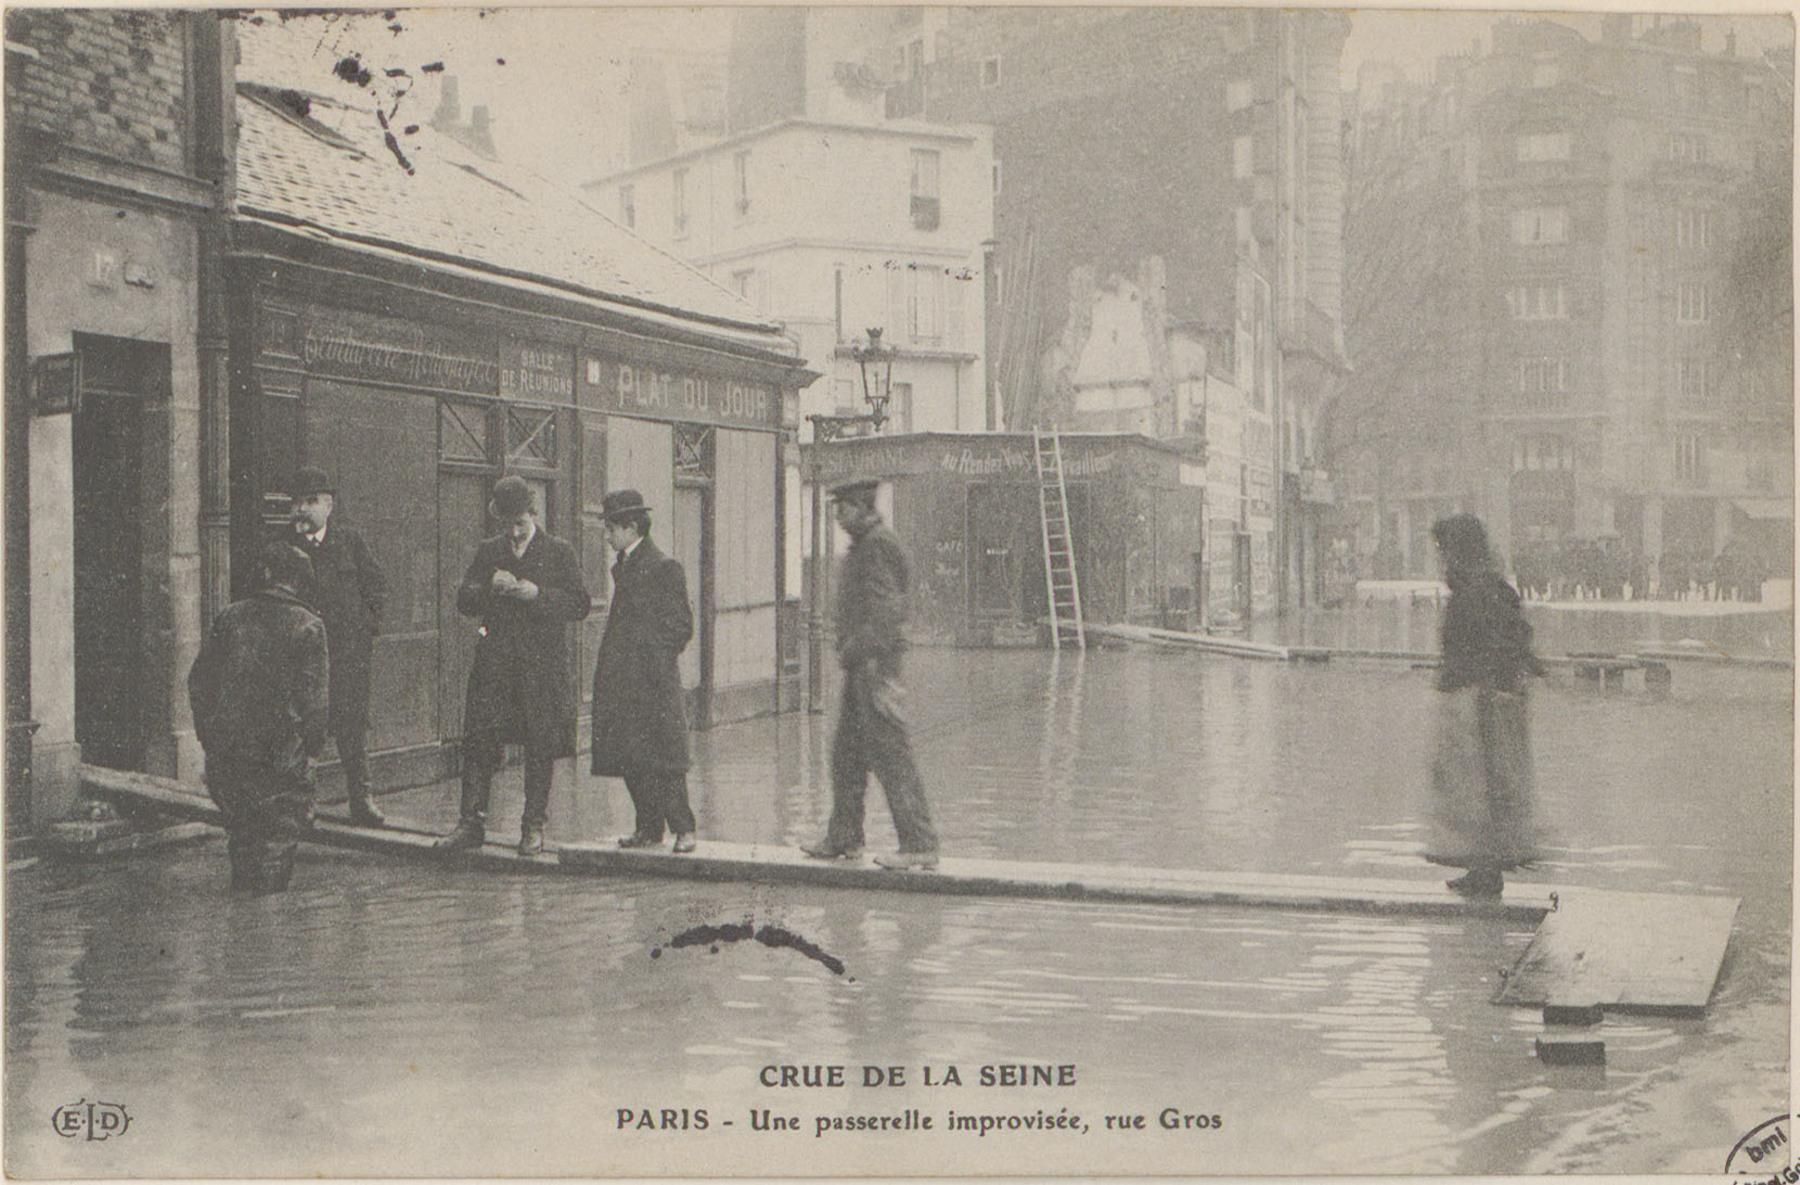 Contenu du Paris, Une Passerelle improvisée, rue Gros